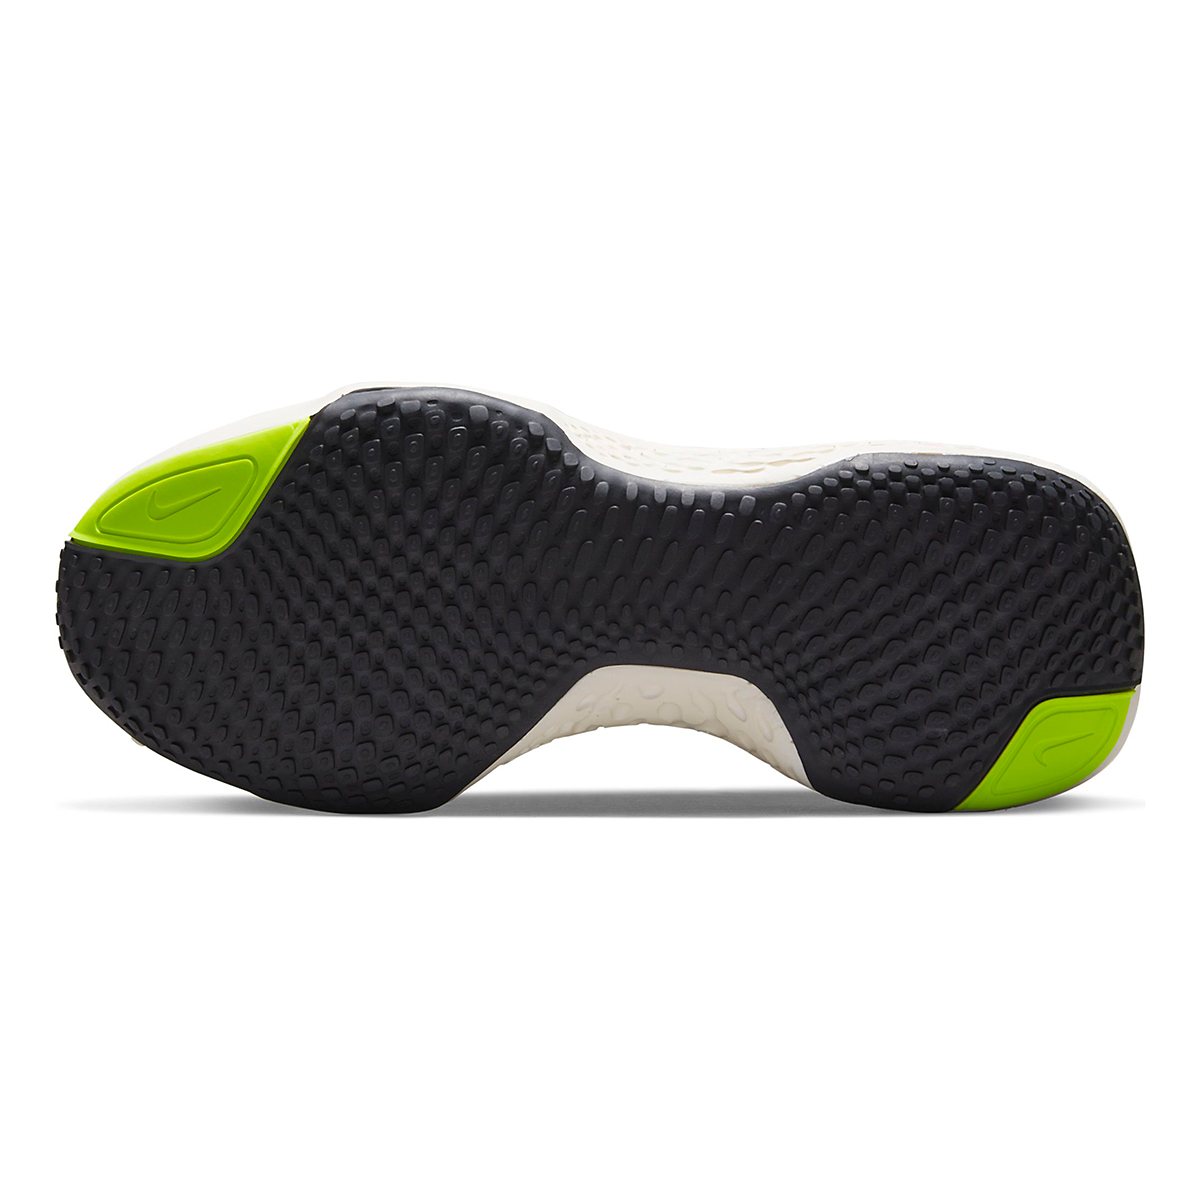 Men's Nike Zoomx Invincible Run FlyKnit Running Shoe - Color: Volt/Black/Barely Volt - Size: 6 - Width: Regular, Volt/Black/Barely Volt, large, image 6